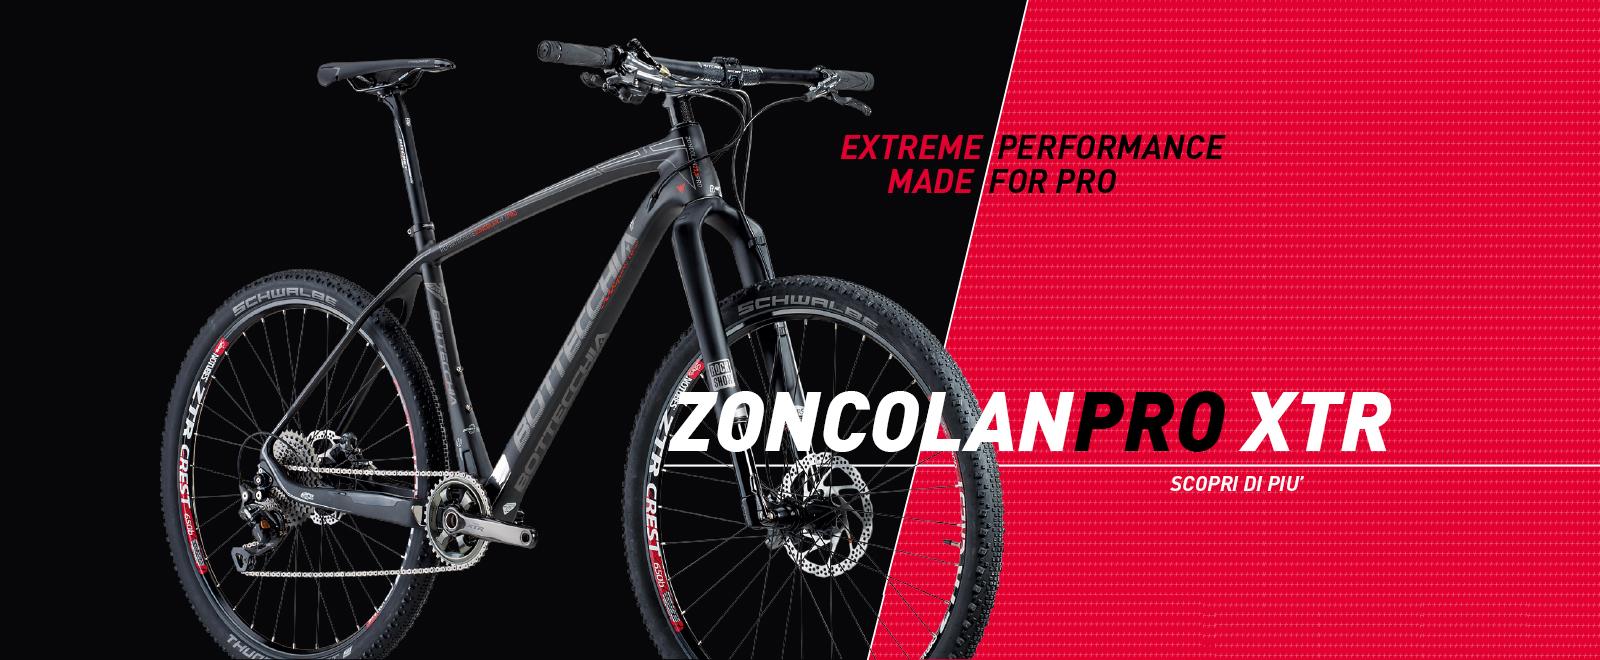 ZONCOLAN-XTR